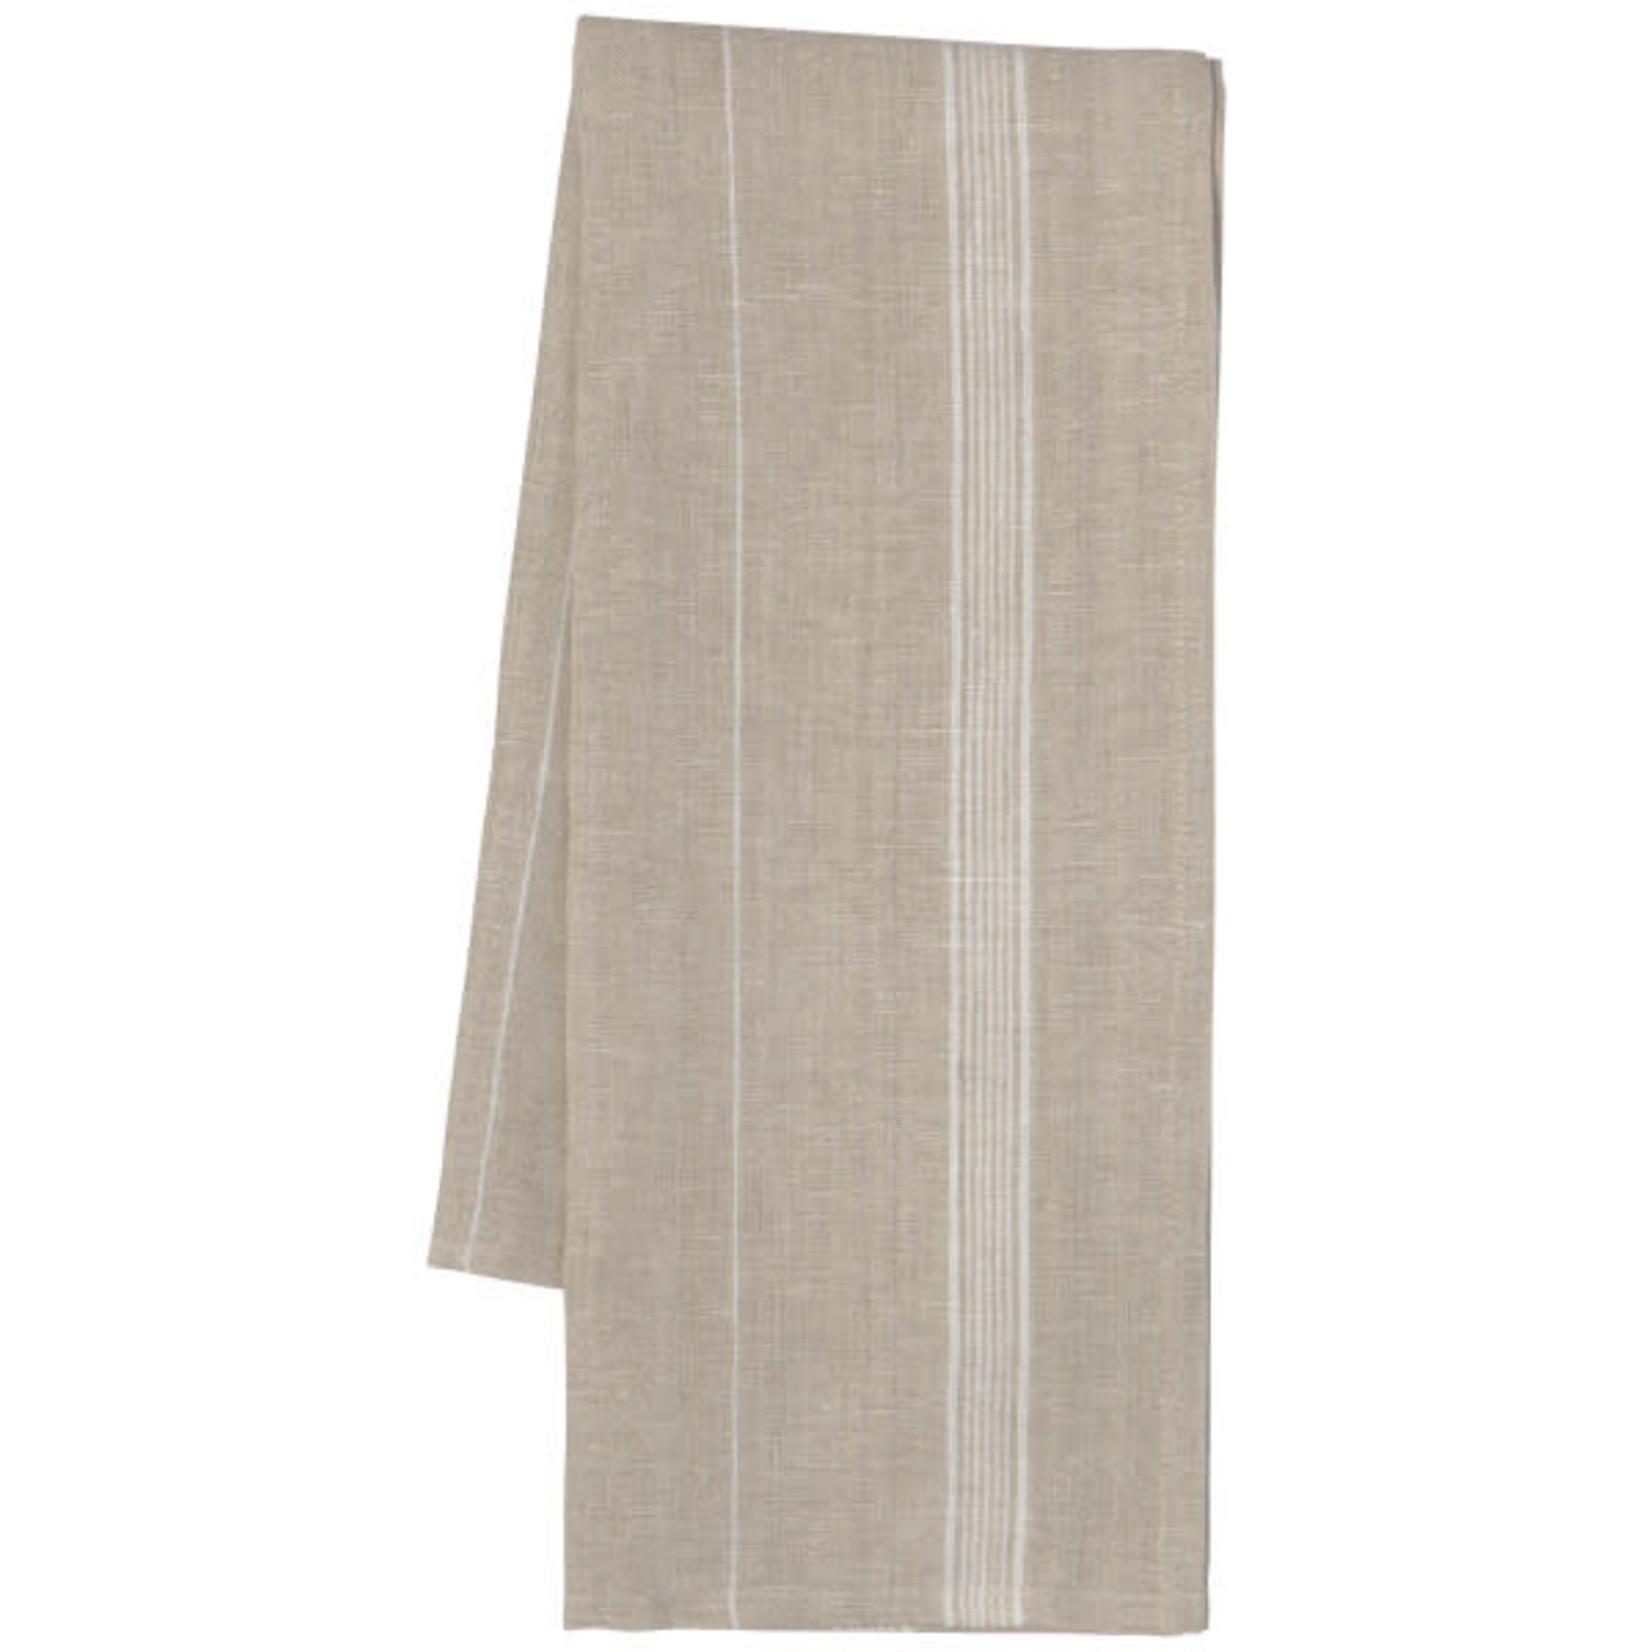 White Maison Stripe Linen -  Tea Towel